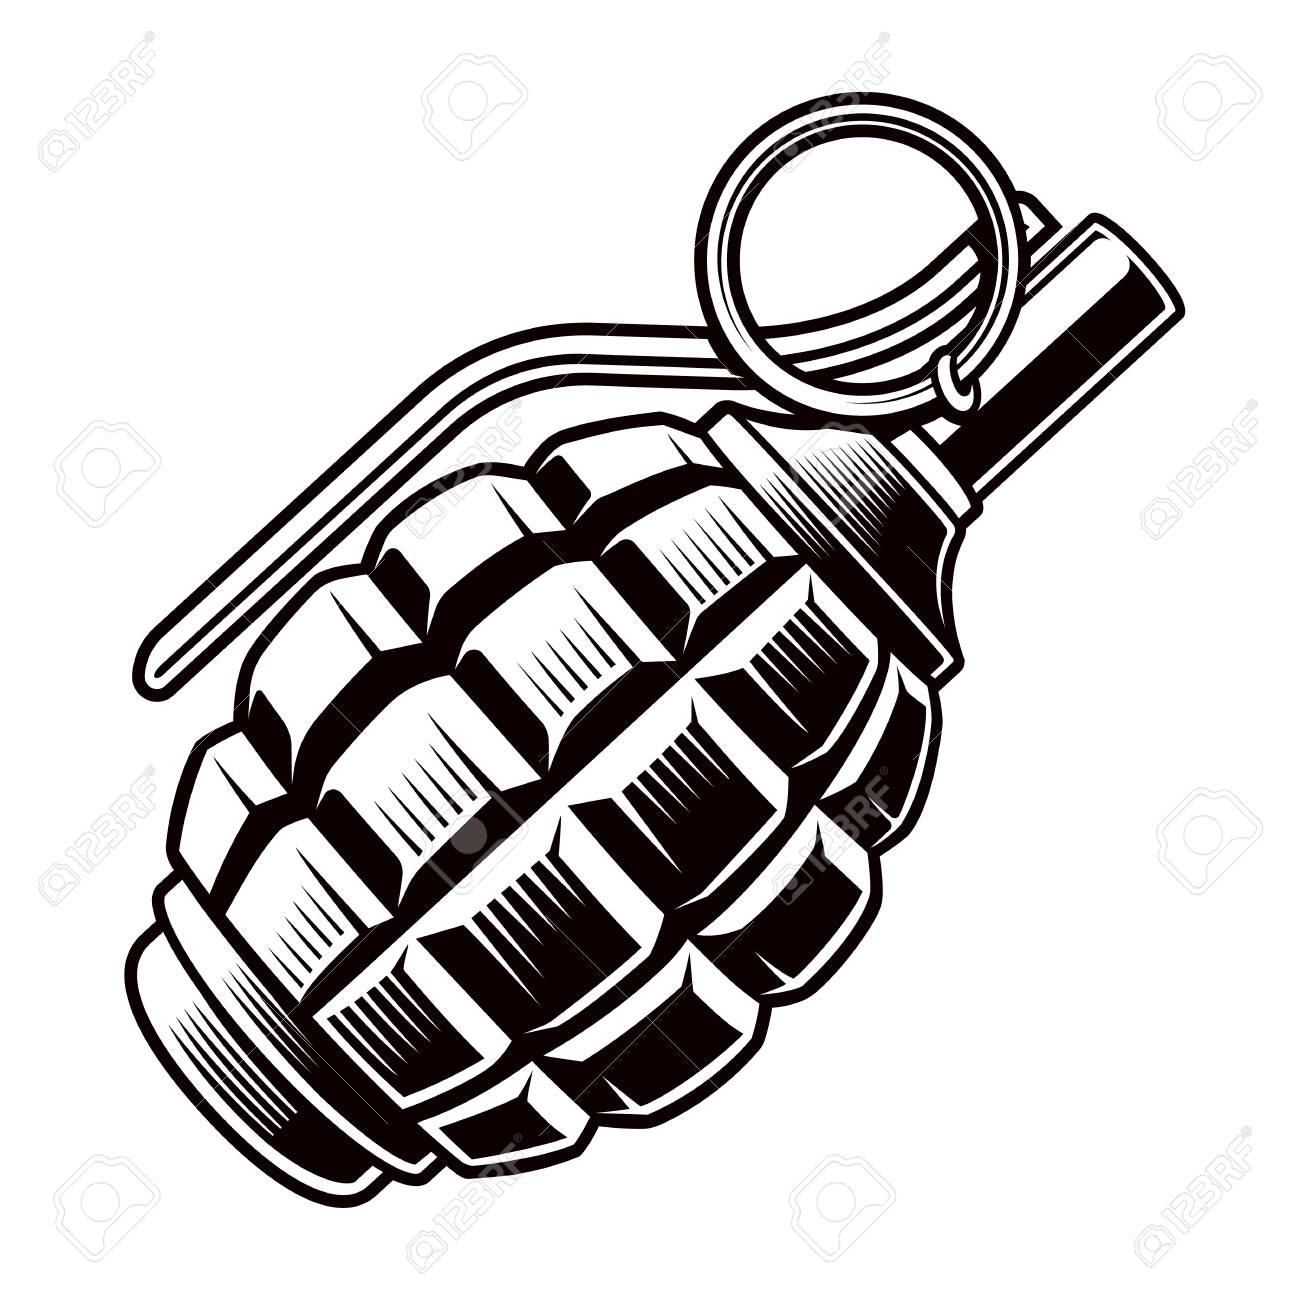 grenade vector black and white illustration royalty free cliparts rh 123rf com